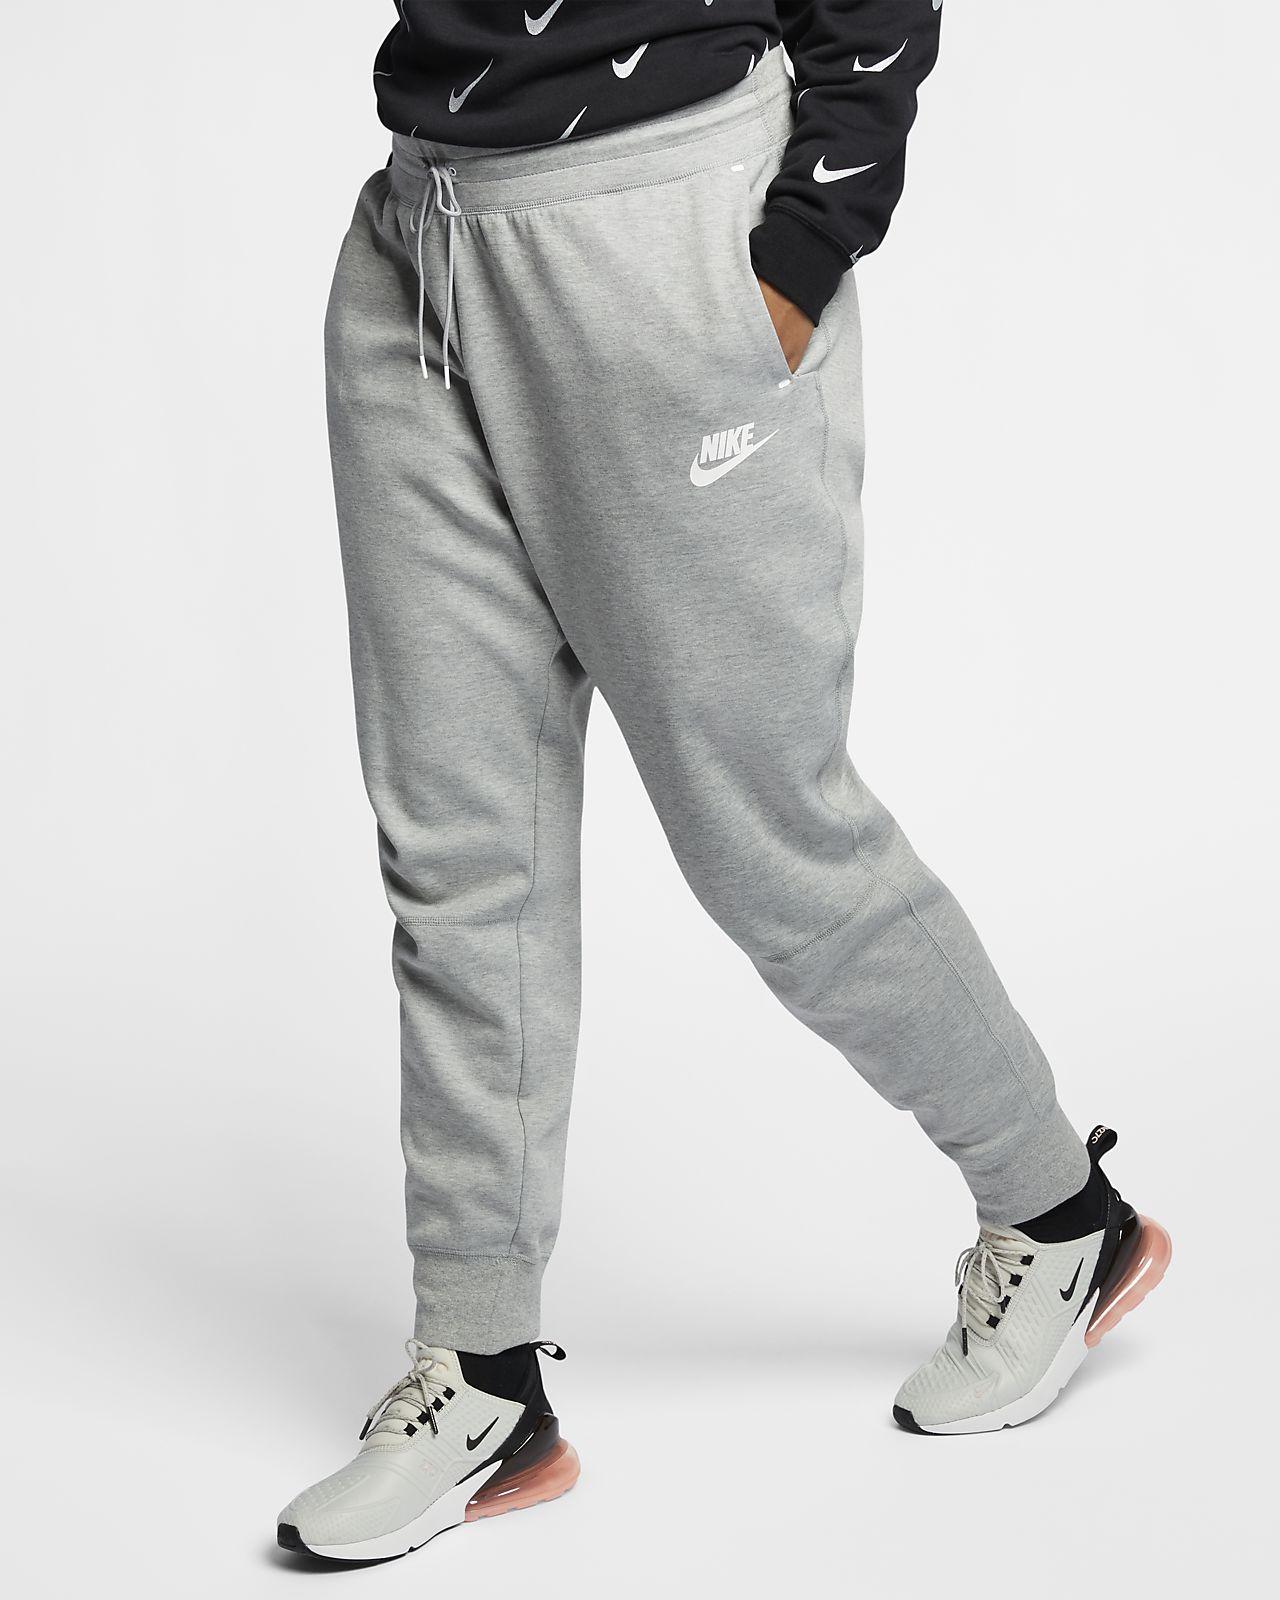 b9179d18ff68 ... Γυναικείο παντελόνι Nike Sportswear Tech Fleece (μεγάλα μεγέθη)